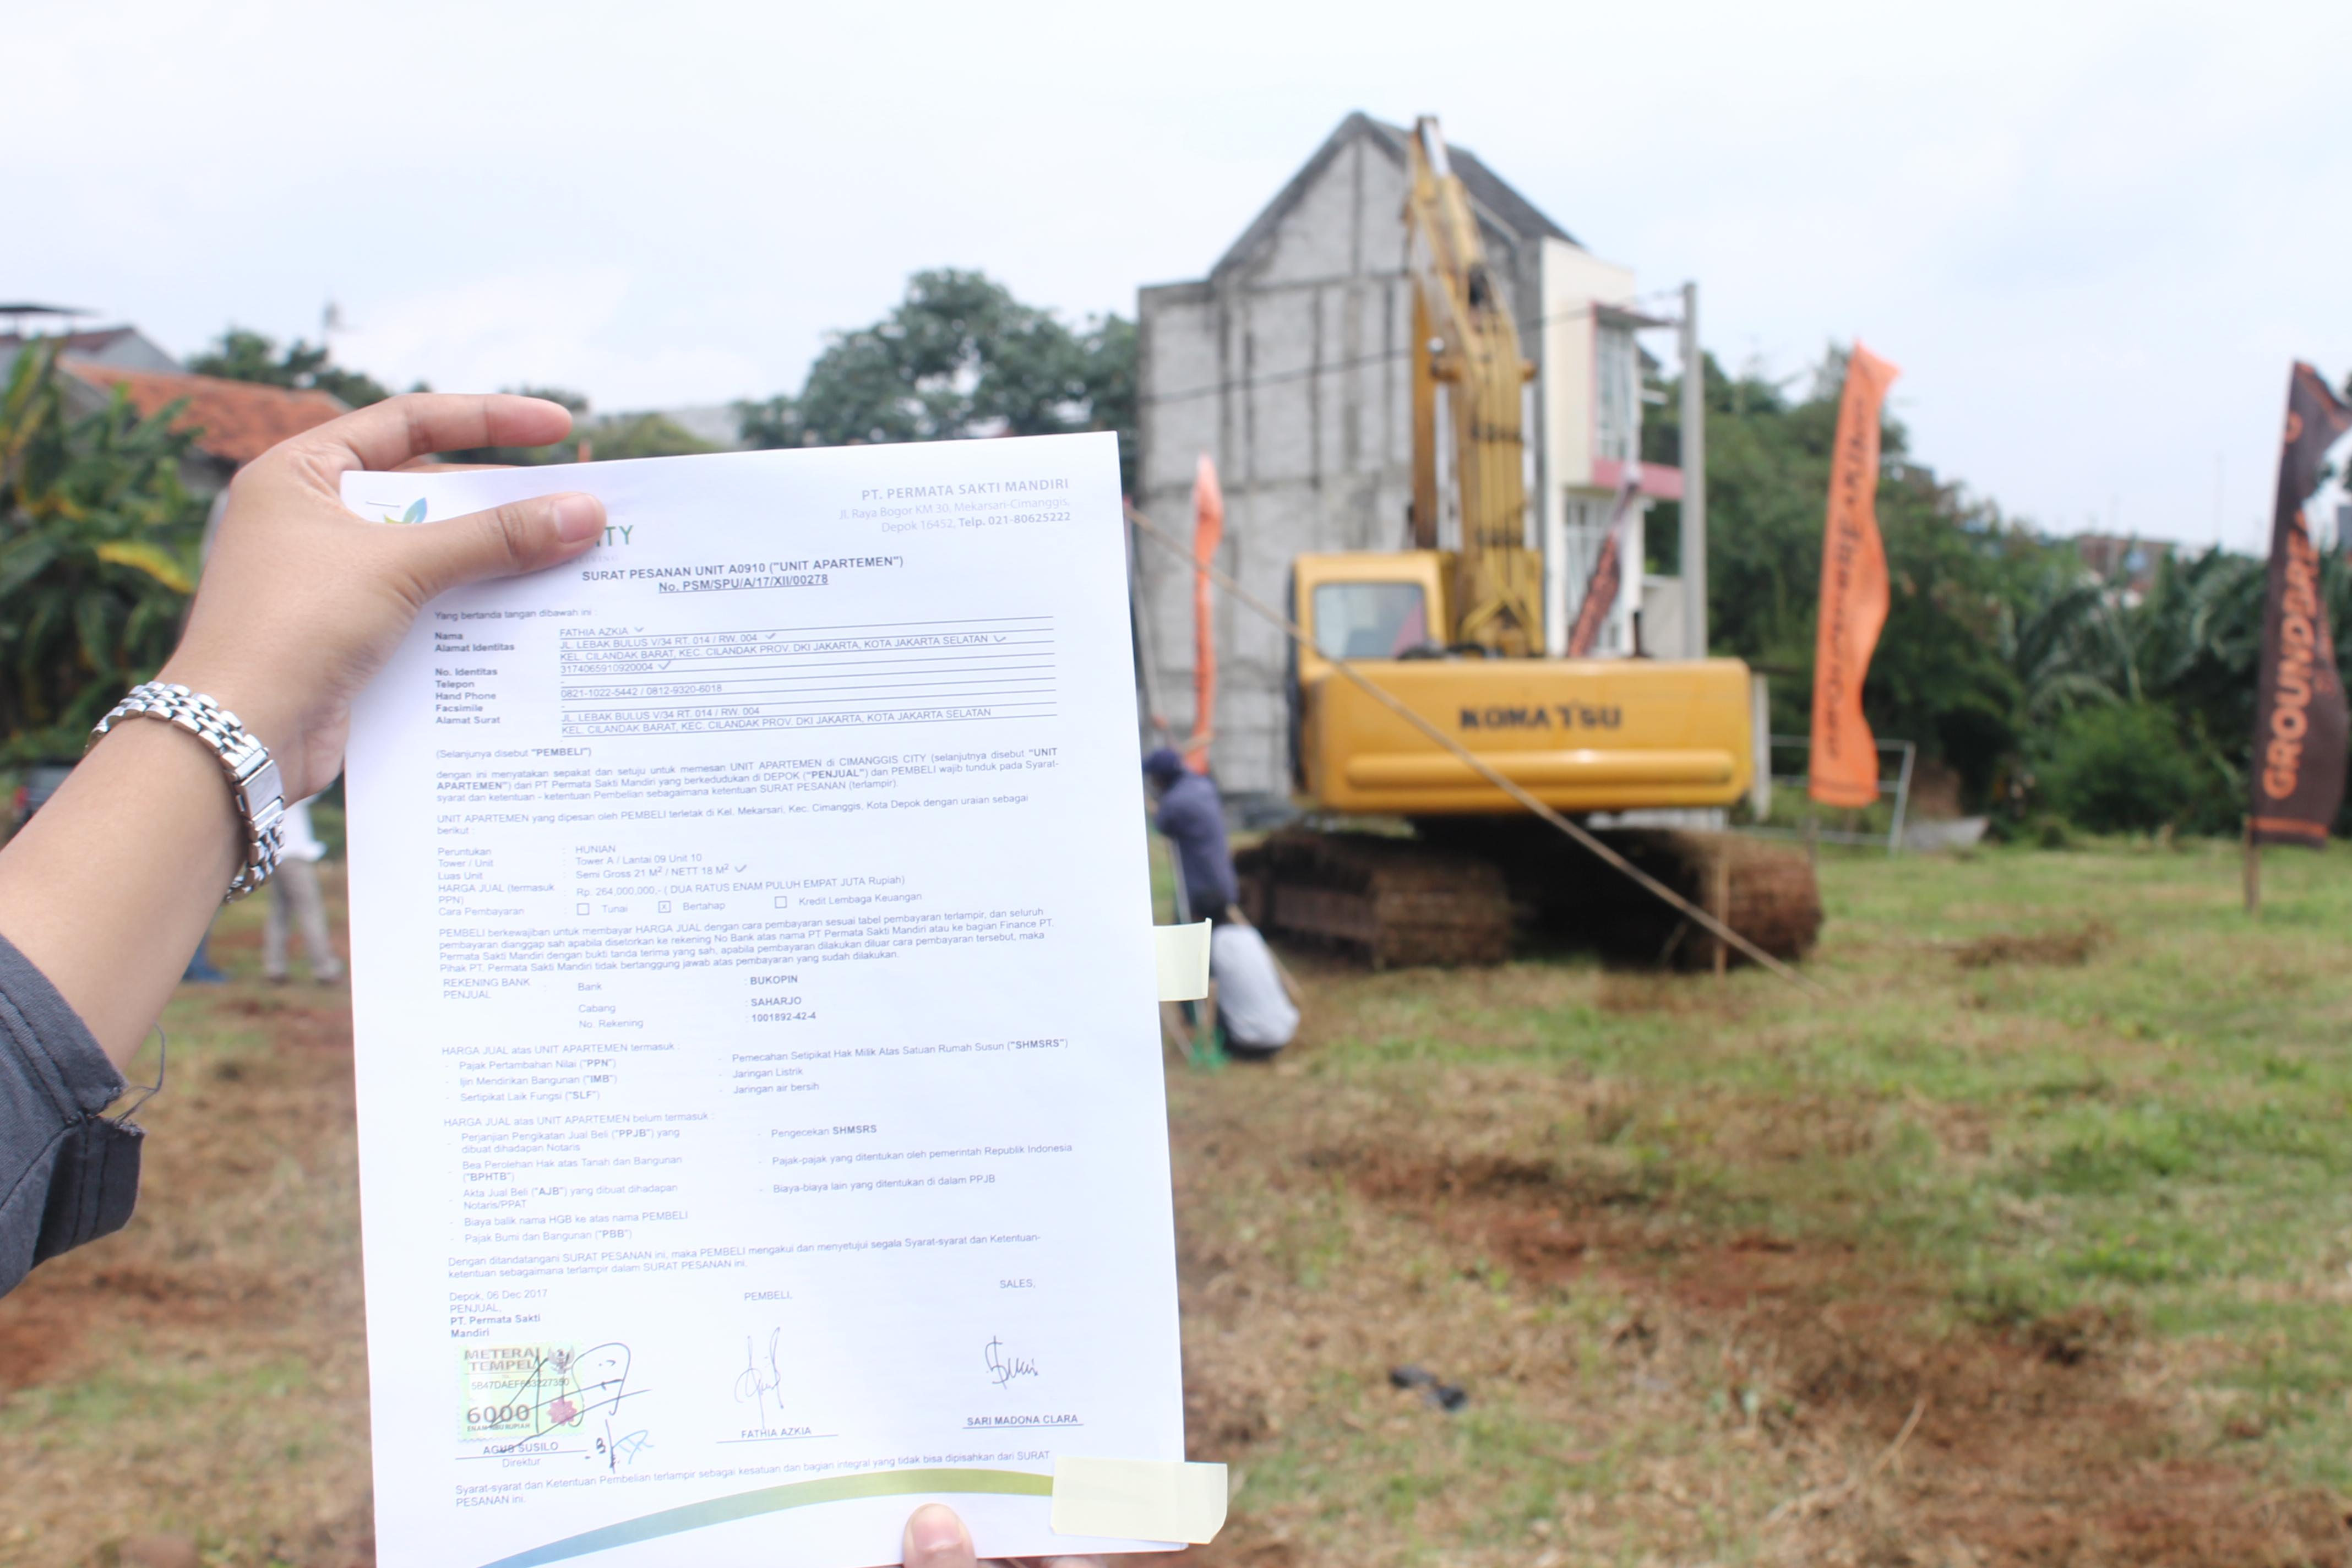 Contoh Surat Perjanjian Jual Beli Tanah Rumahcom